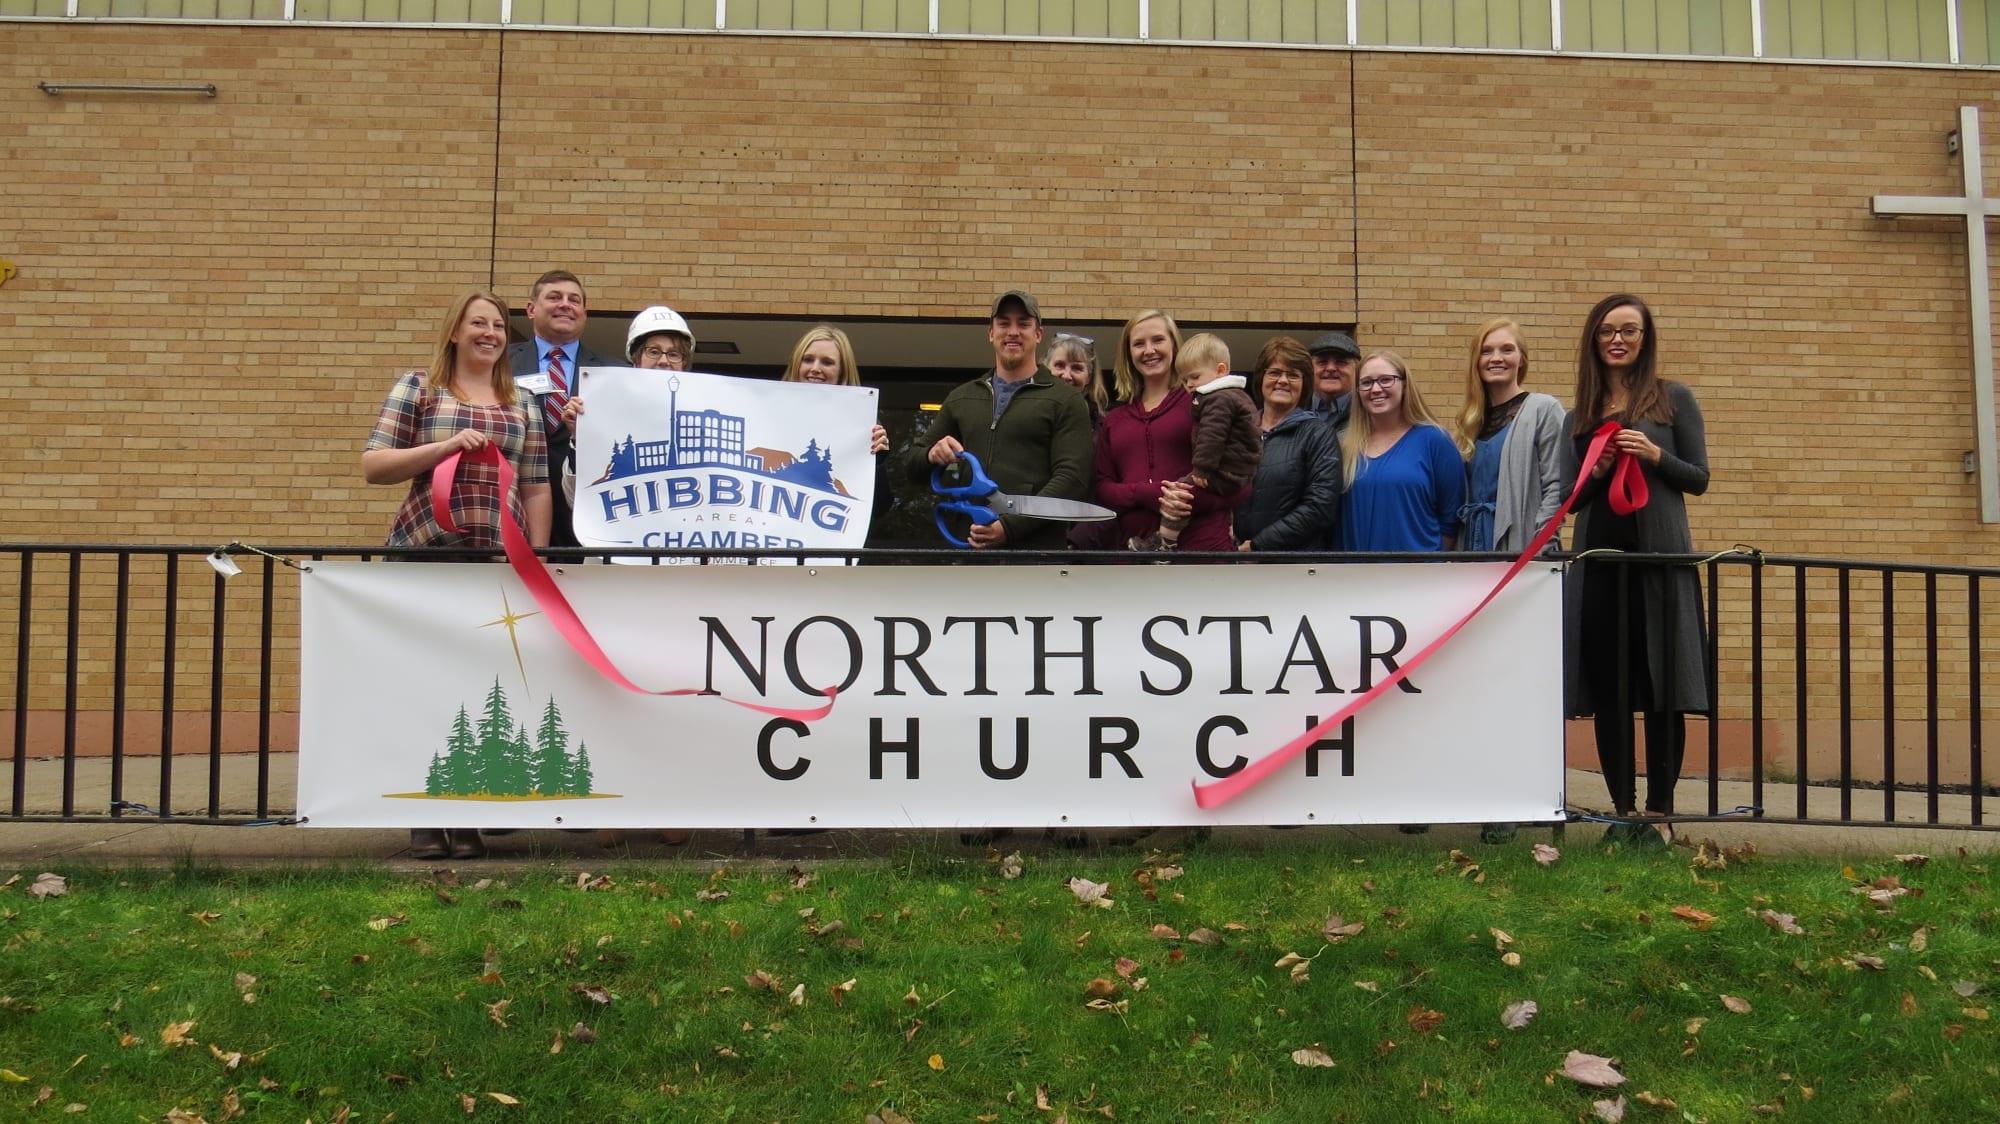 North Star Church of Hibbing - Relocation